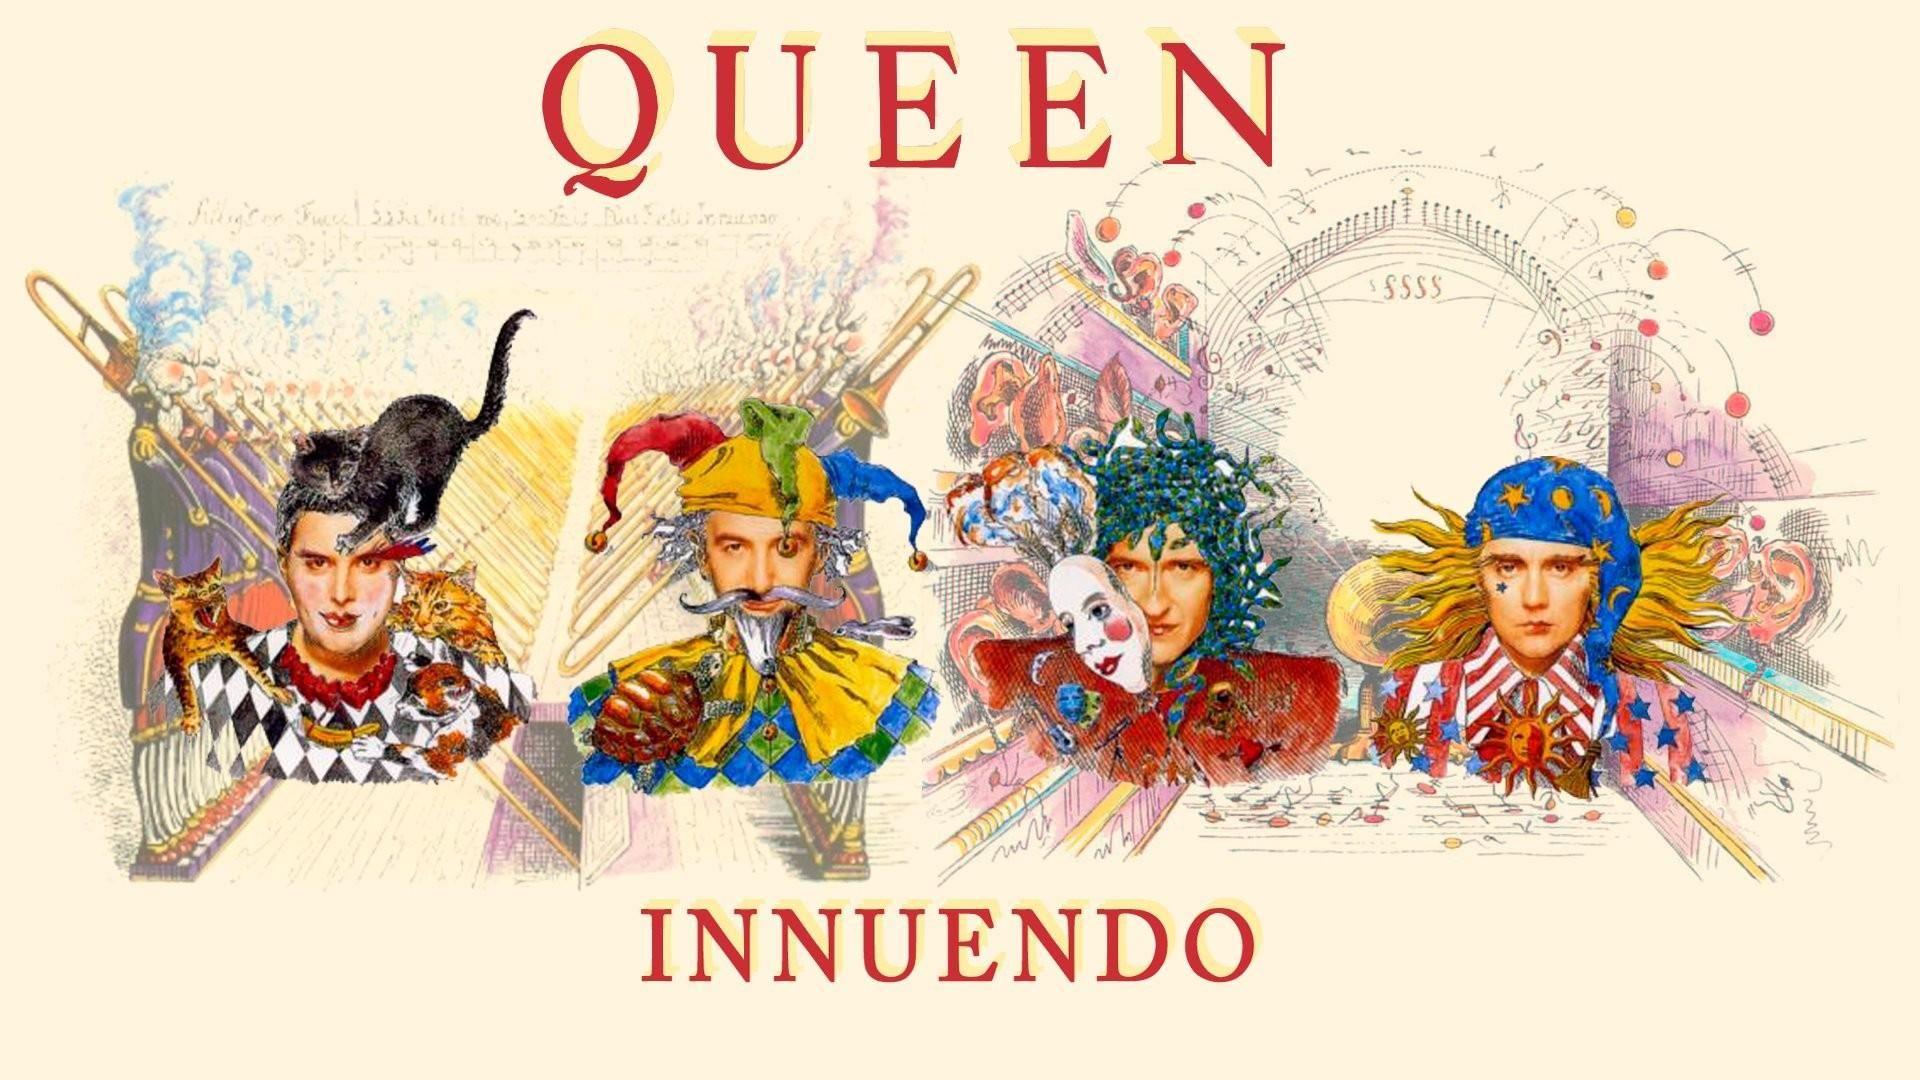 Queen Band Hd Wallpapers Backgrounds Wallpaper Queens Wallpaper Queen Albums Queen Band